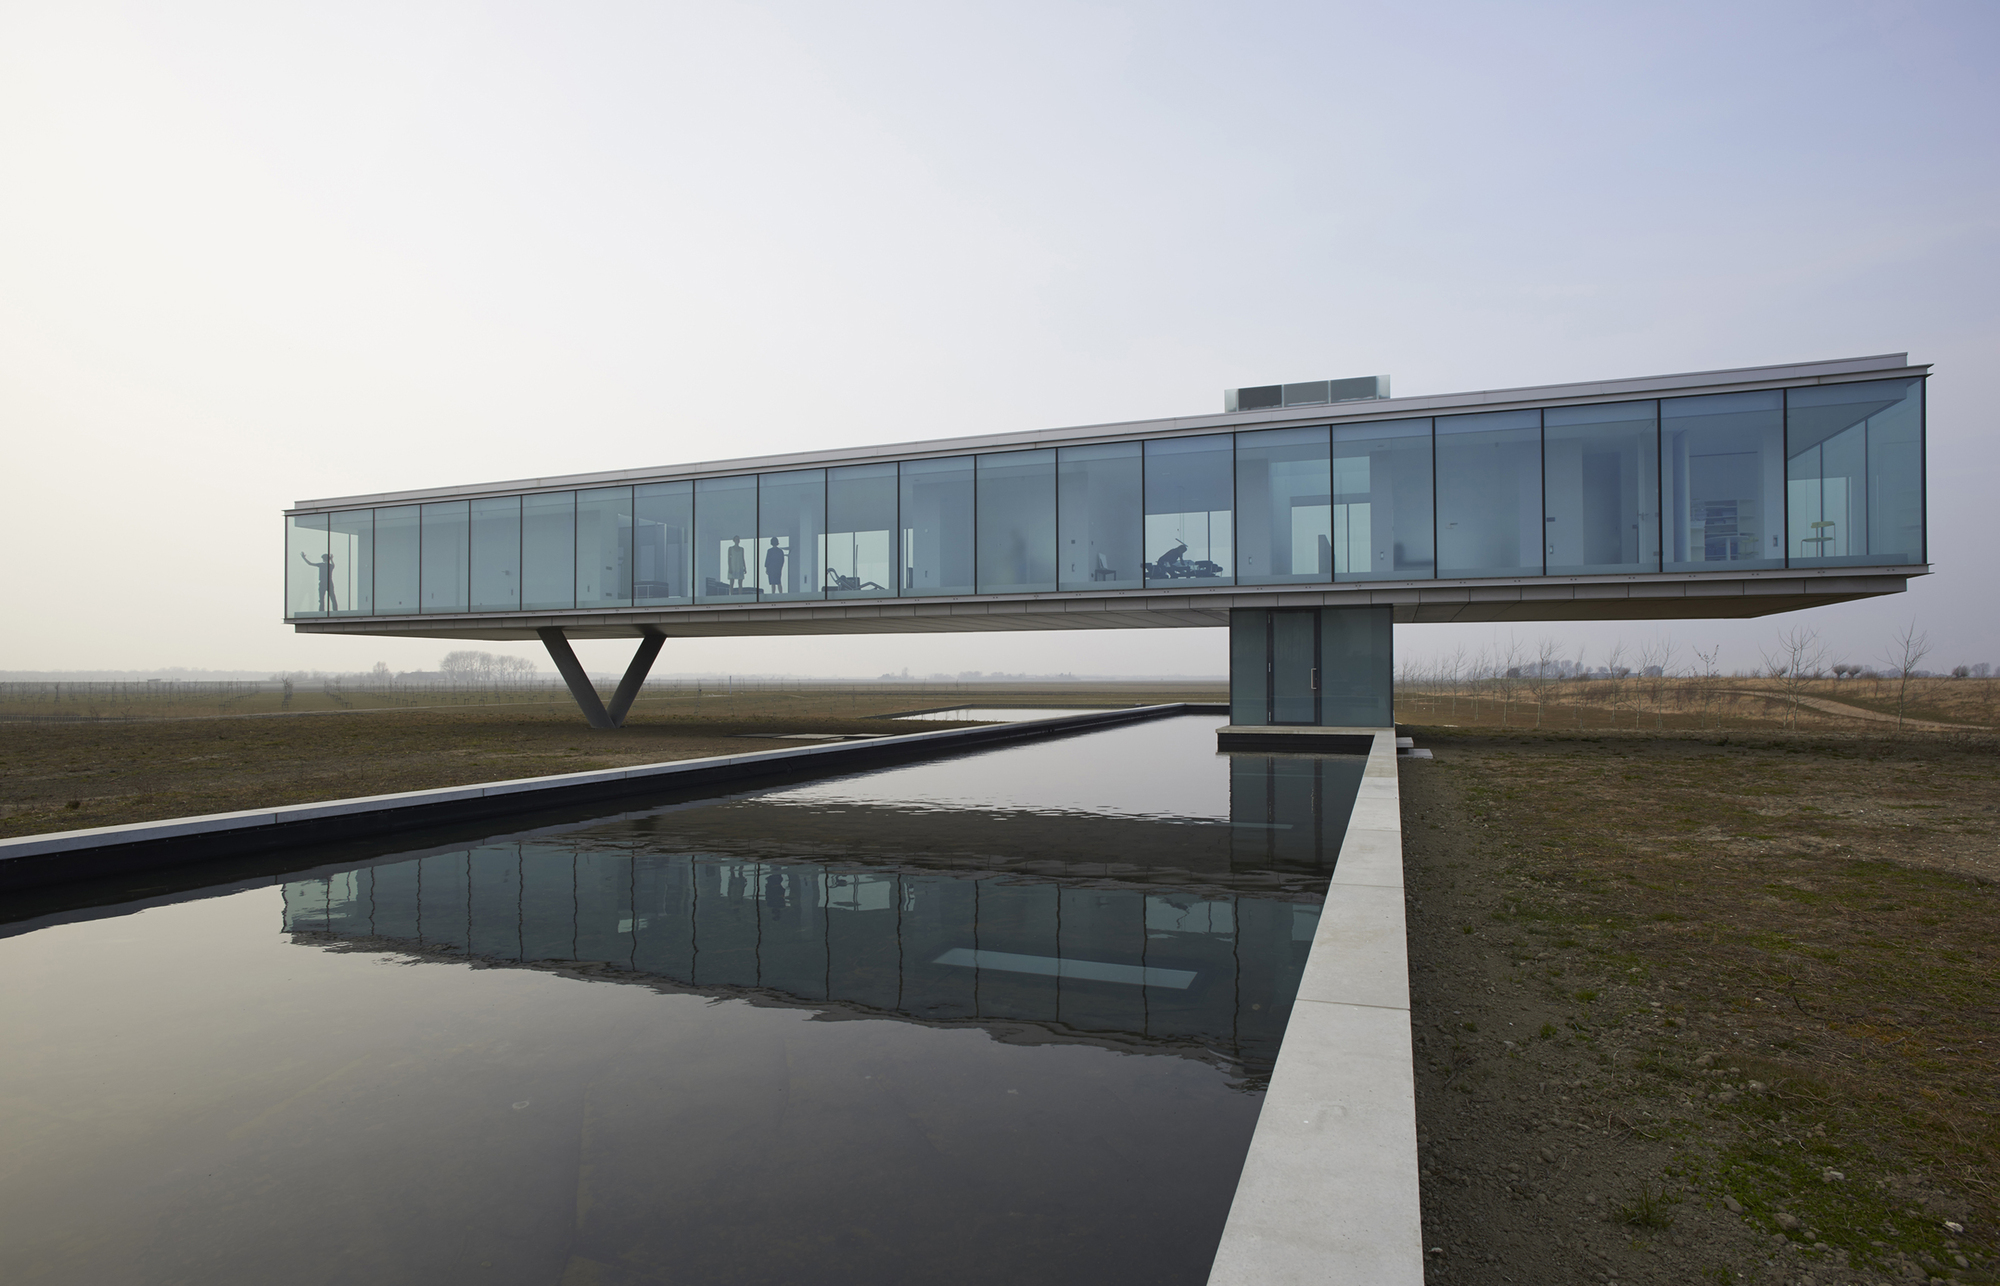 52a114bde8e44e00d8000034_villa-kogelhof-paul-de-ruiter-architects_portada